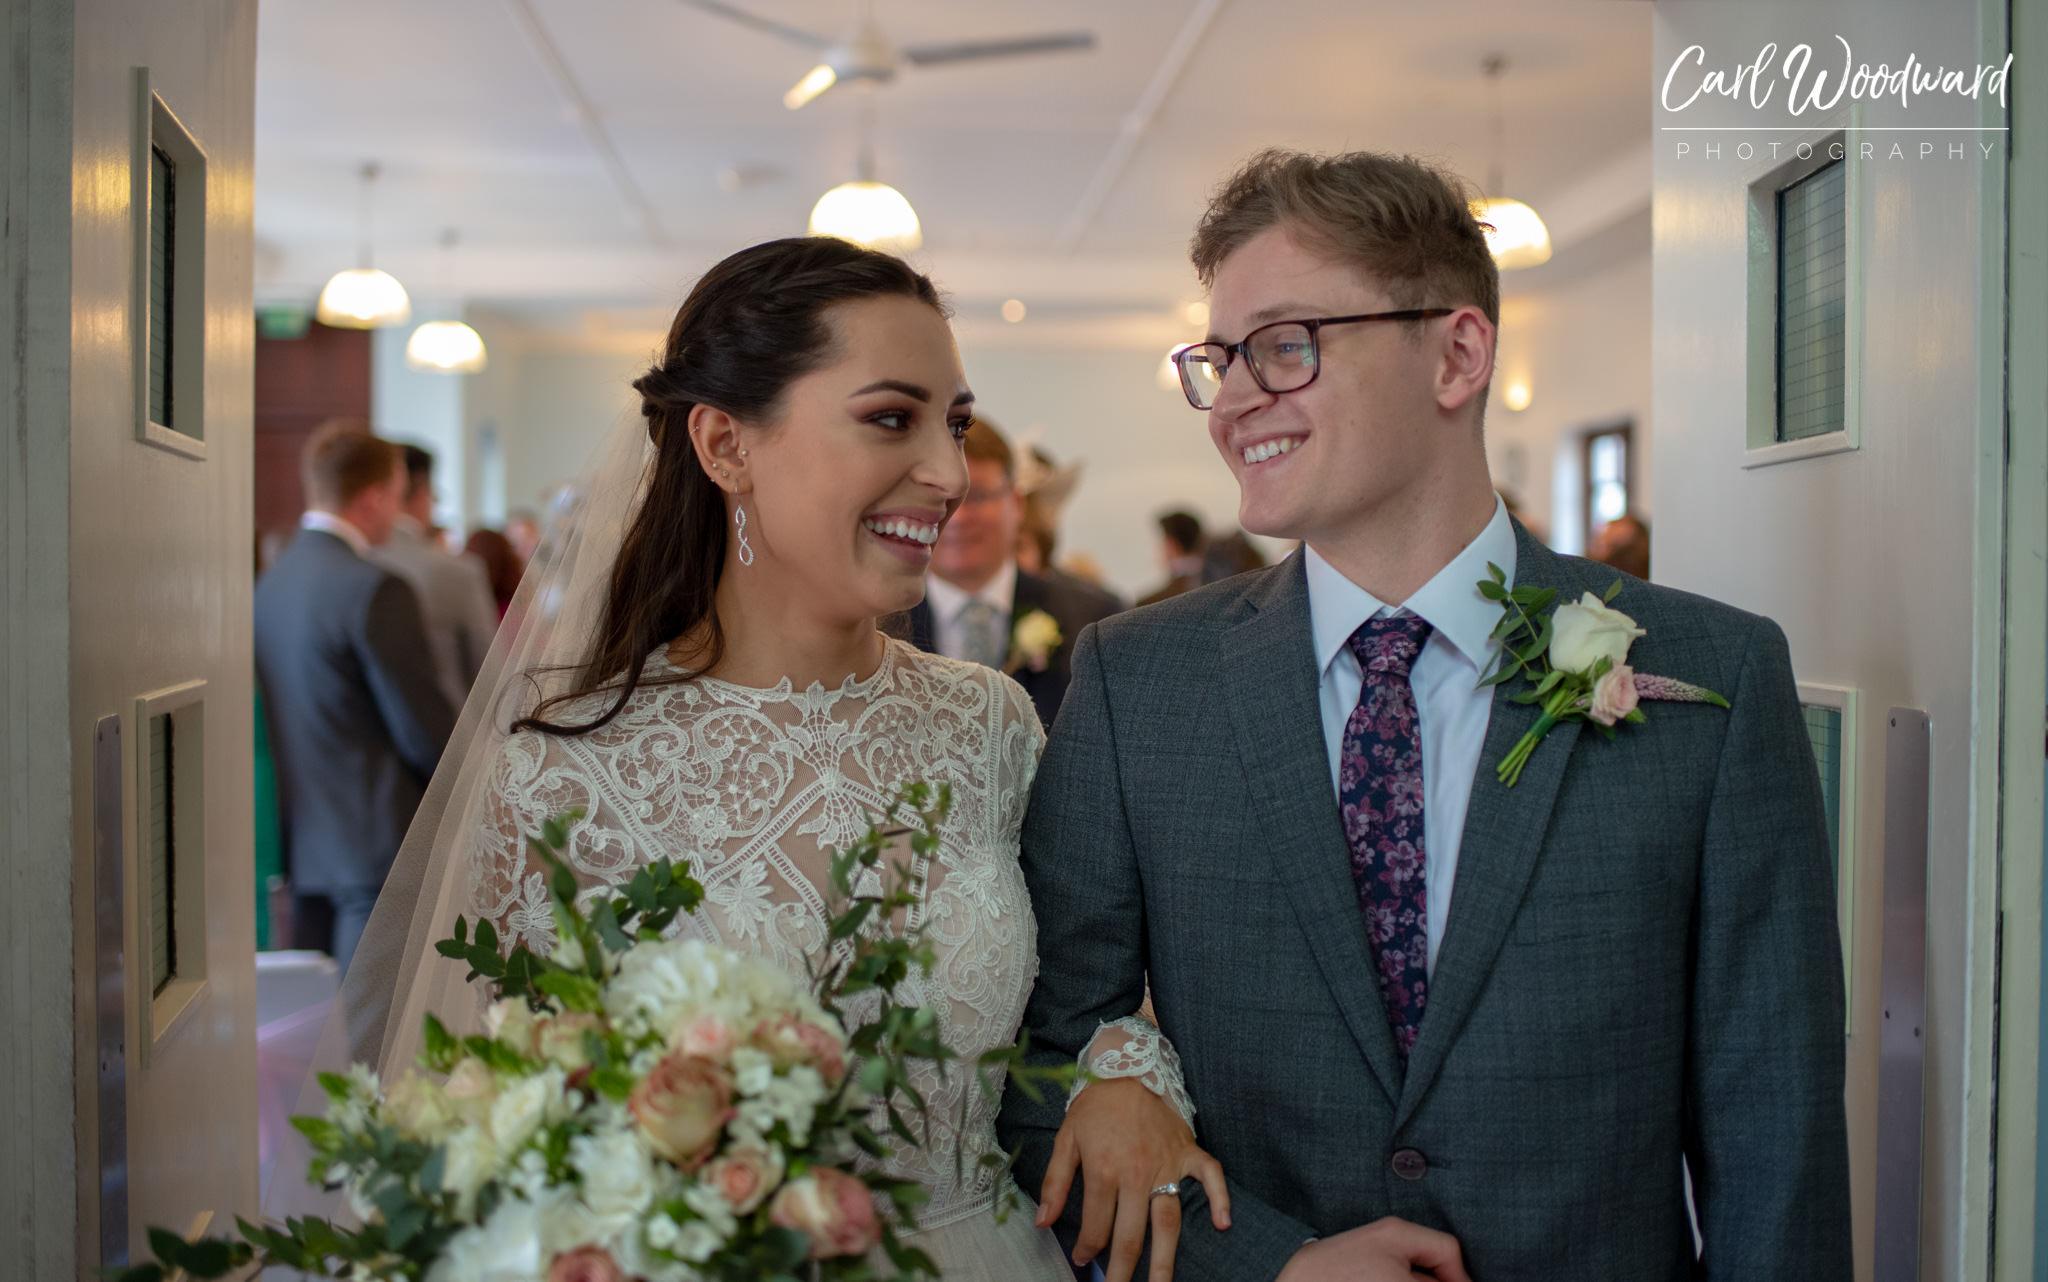 007-pencoed-house-estate-wedding-wedding-photography-cardiff-wedding-photographer.jpg